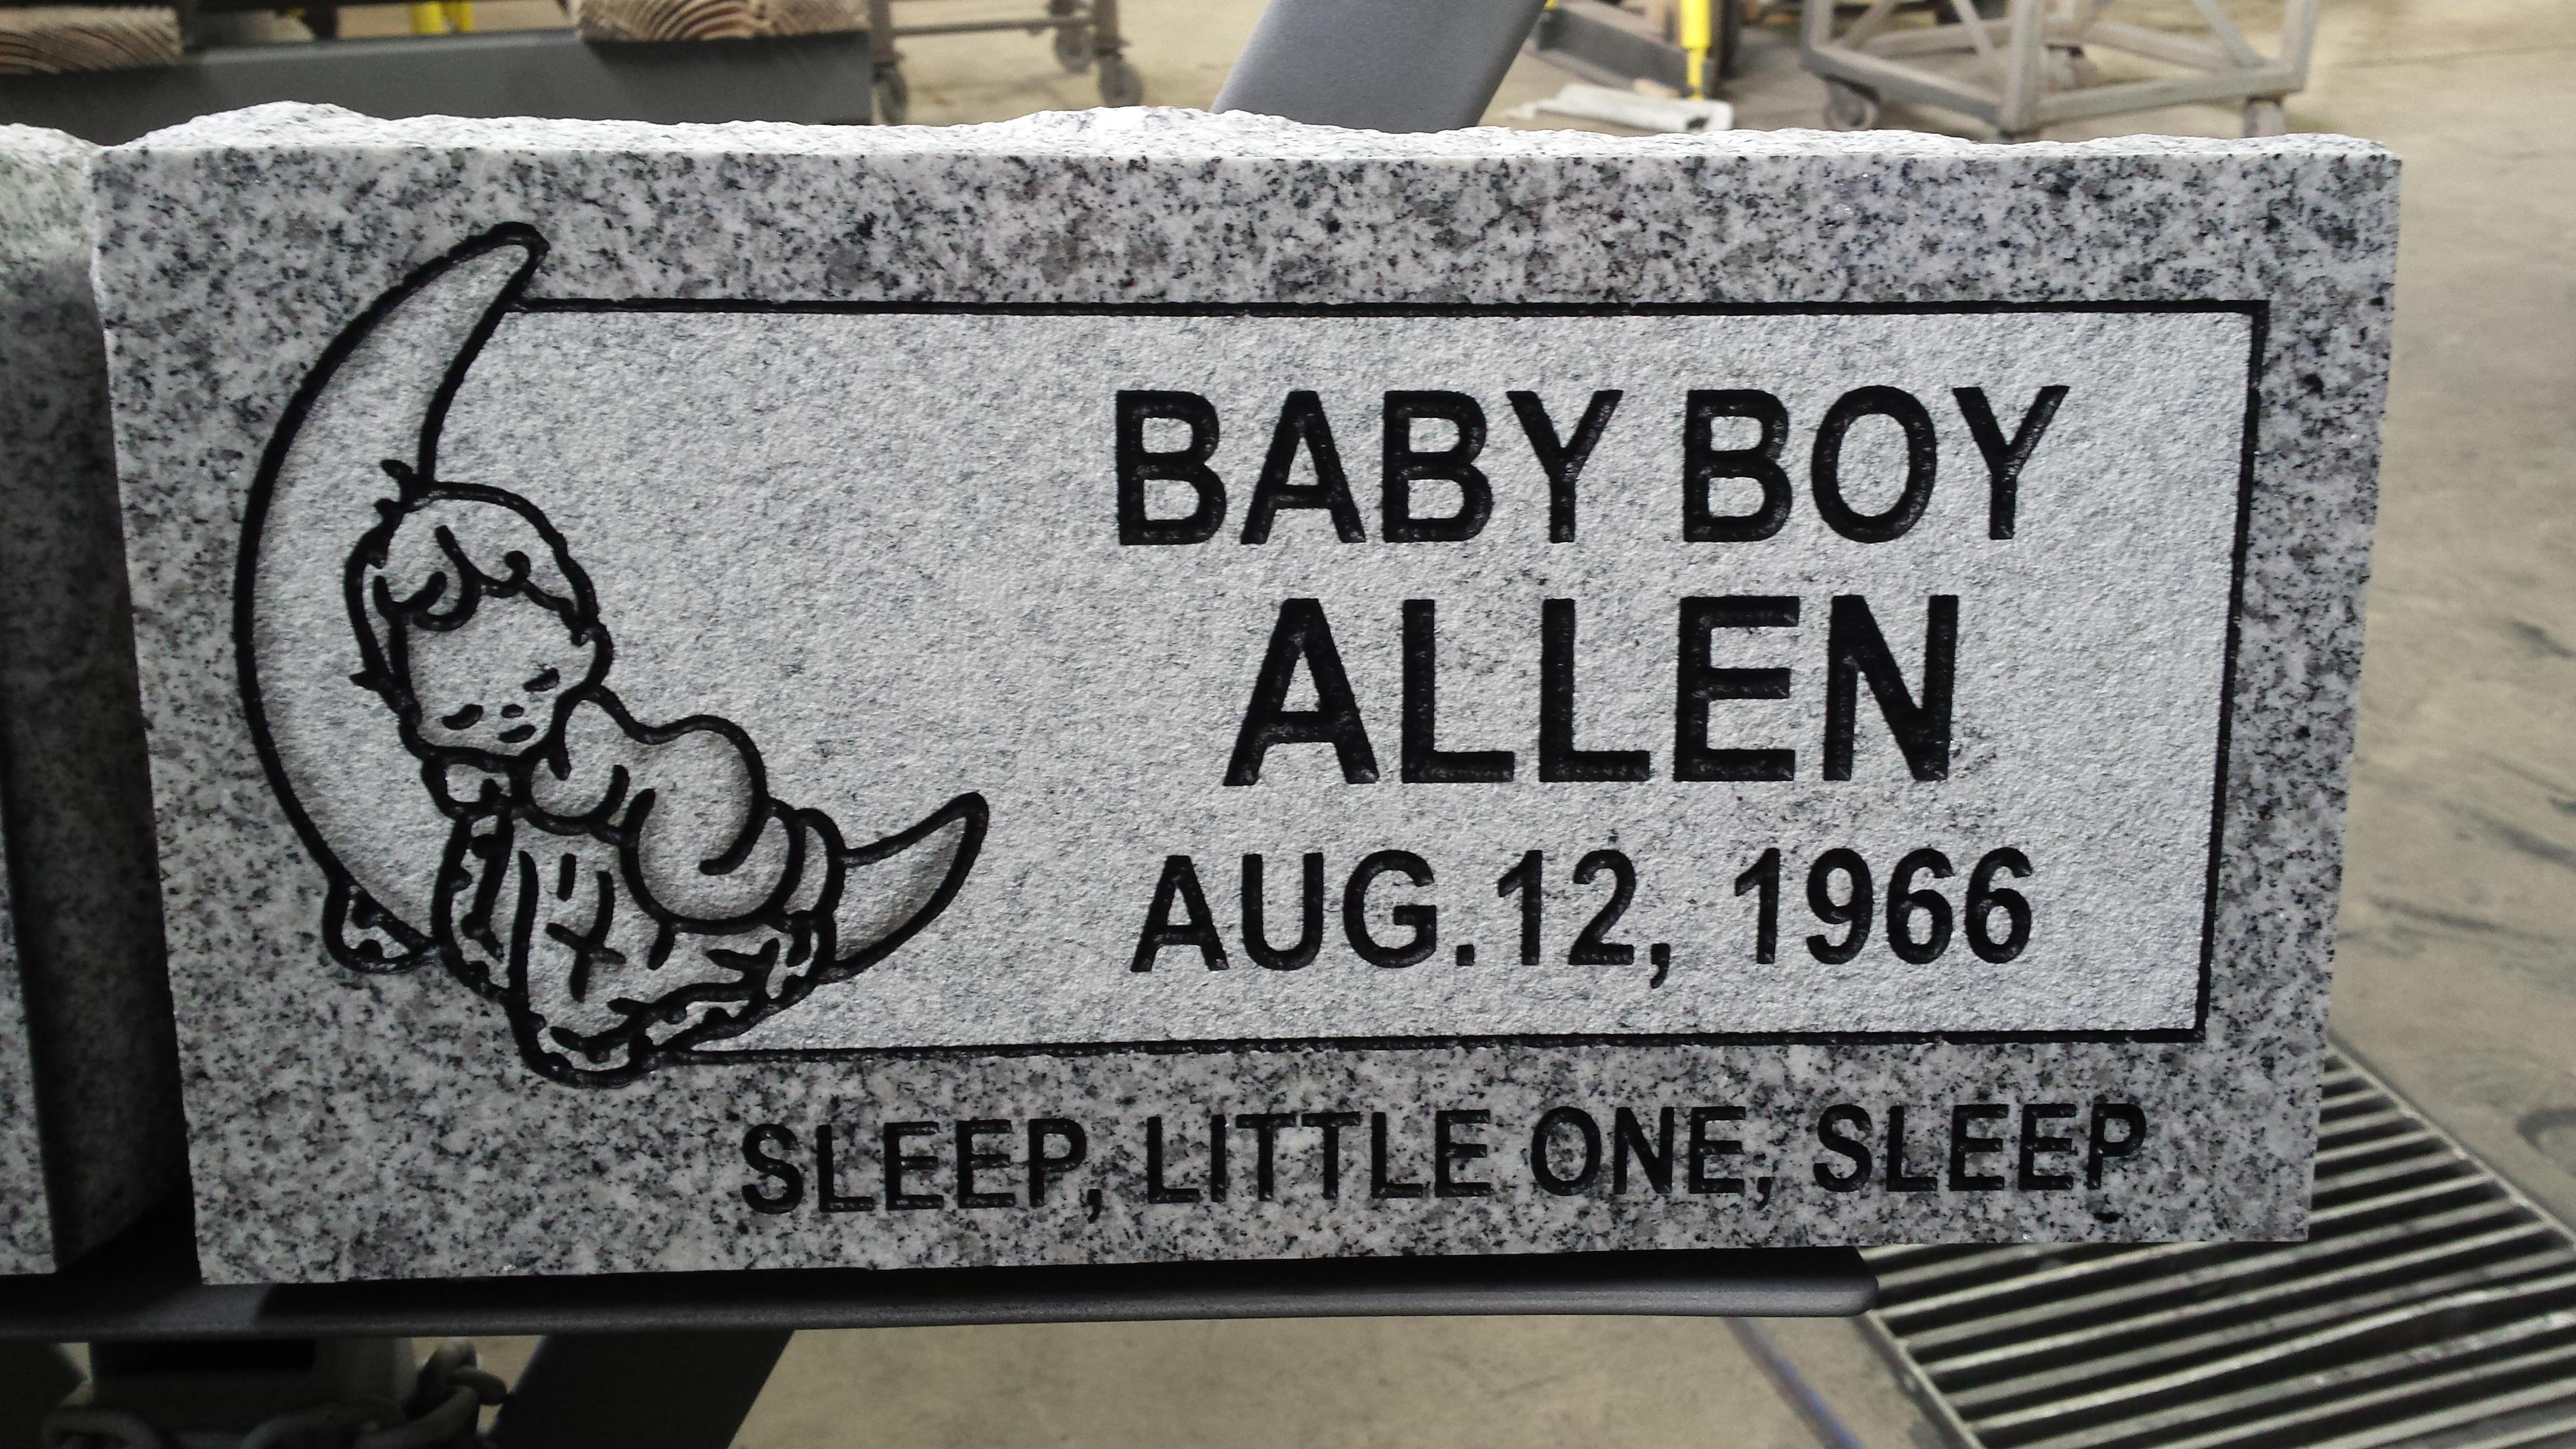 Allen-Boy Sleeping on Moon